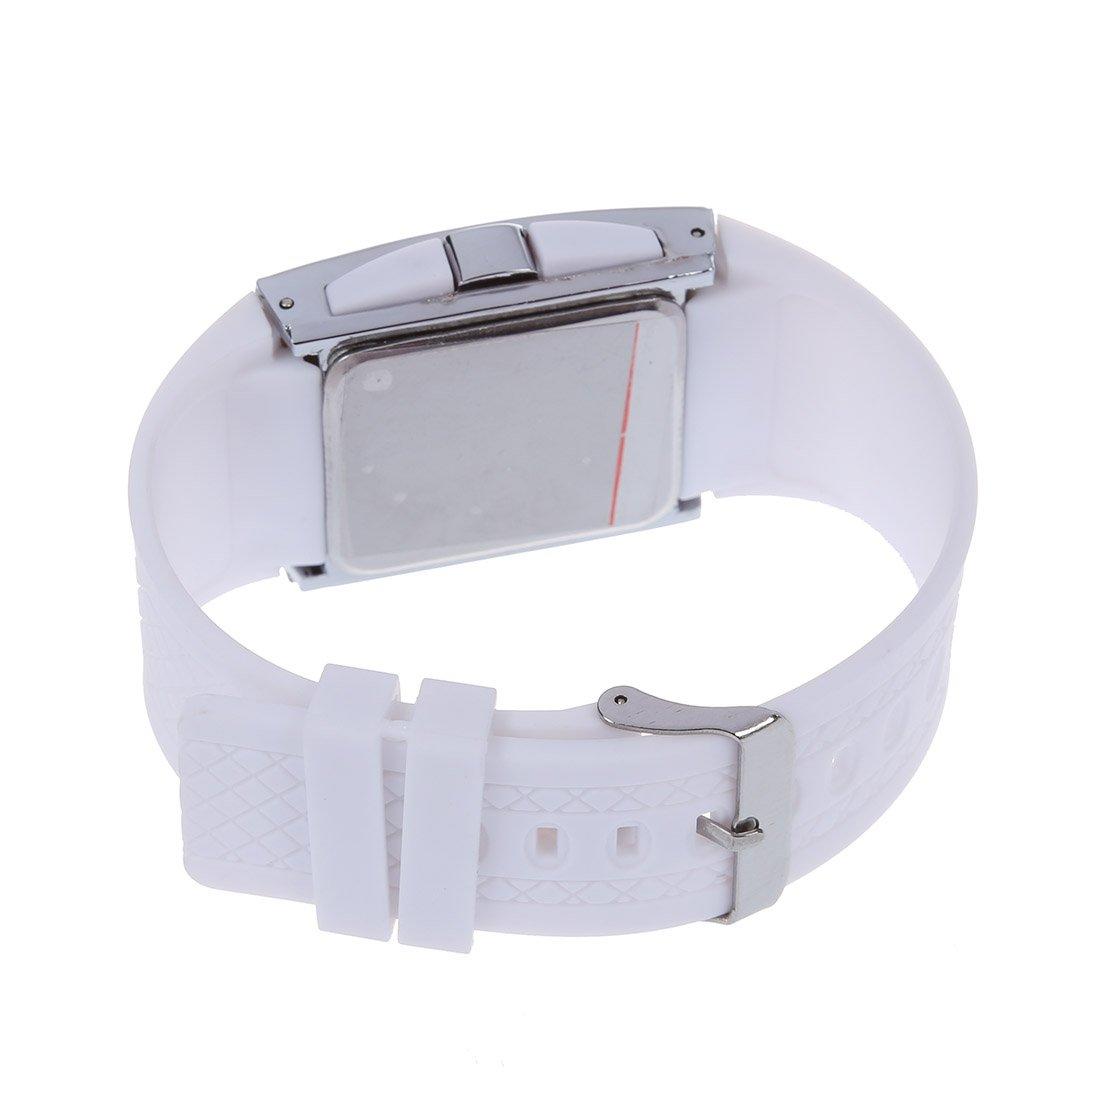 Amazon.com: TOOGOO(R) 2015 new led watch luxury fashion men womens Digital Sport strap wristwatch for ladies dress watches clock-All White: Watches